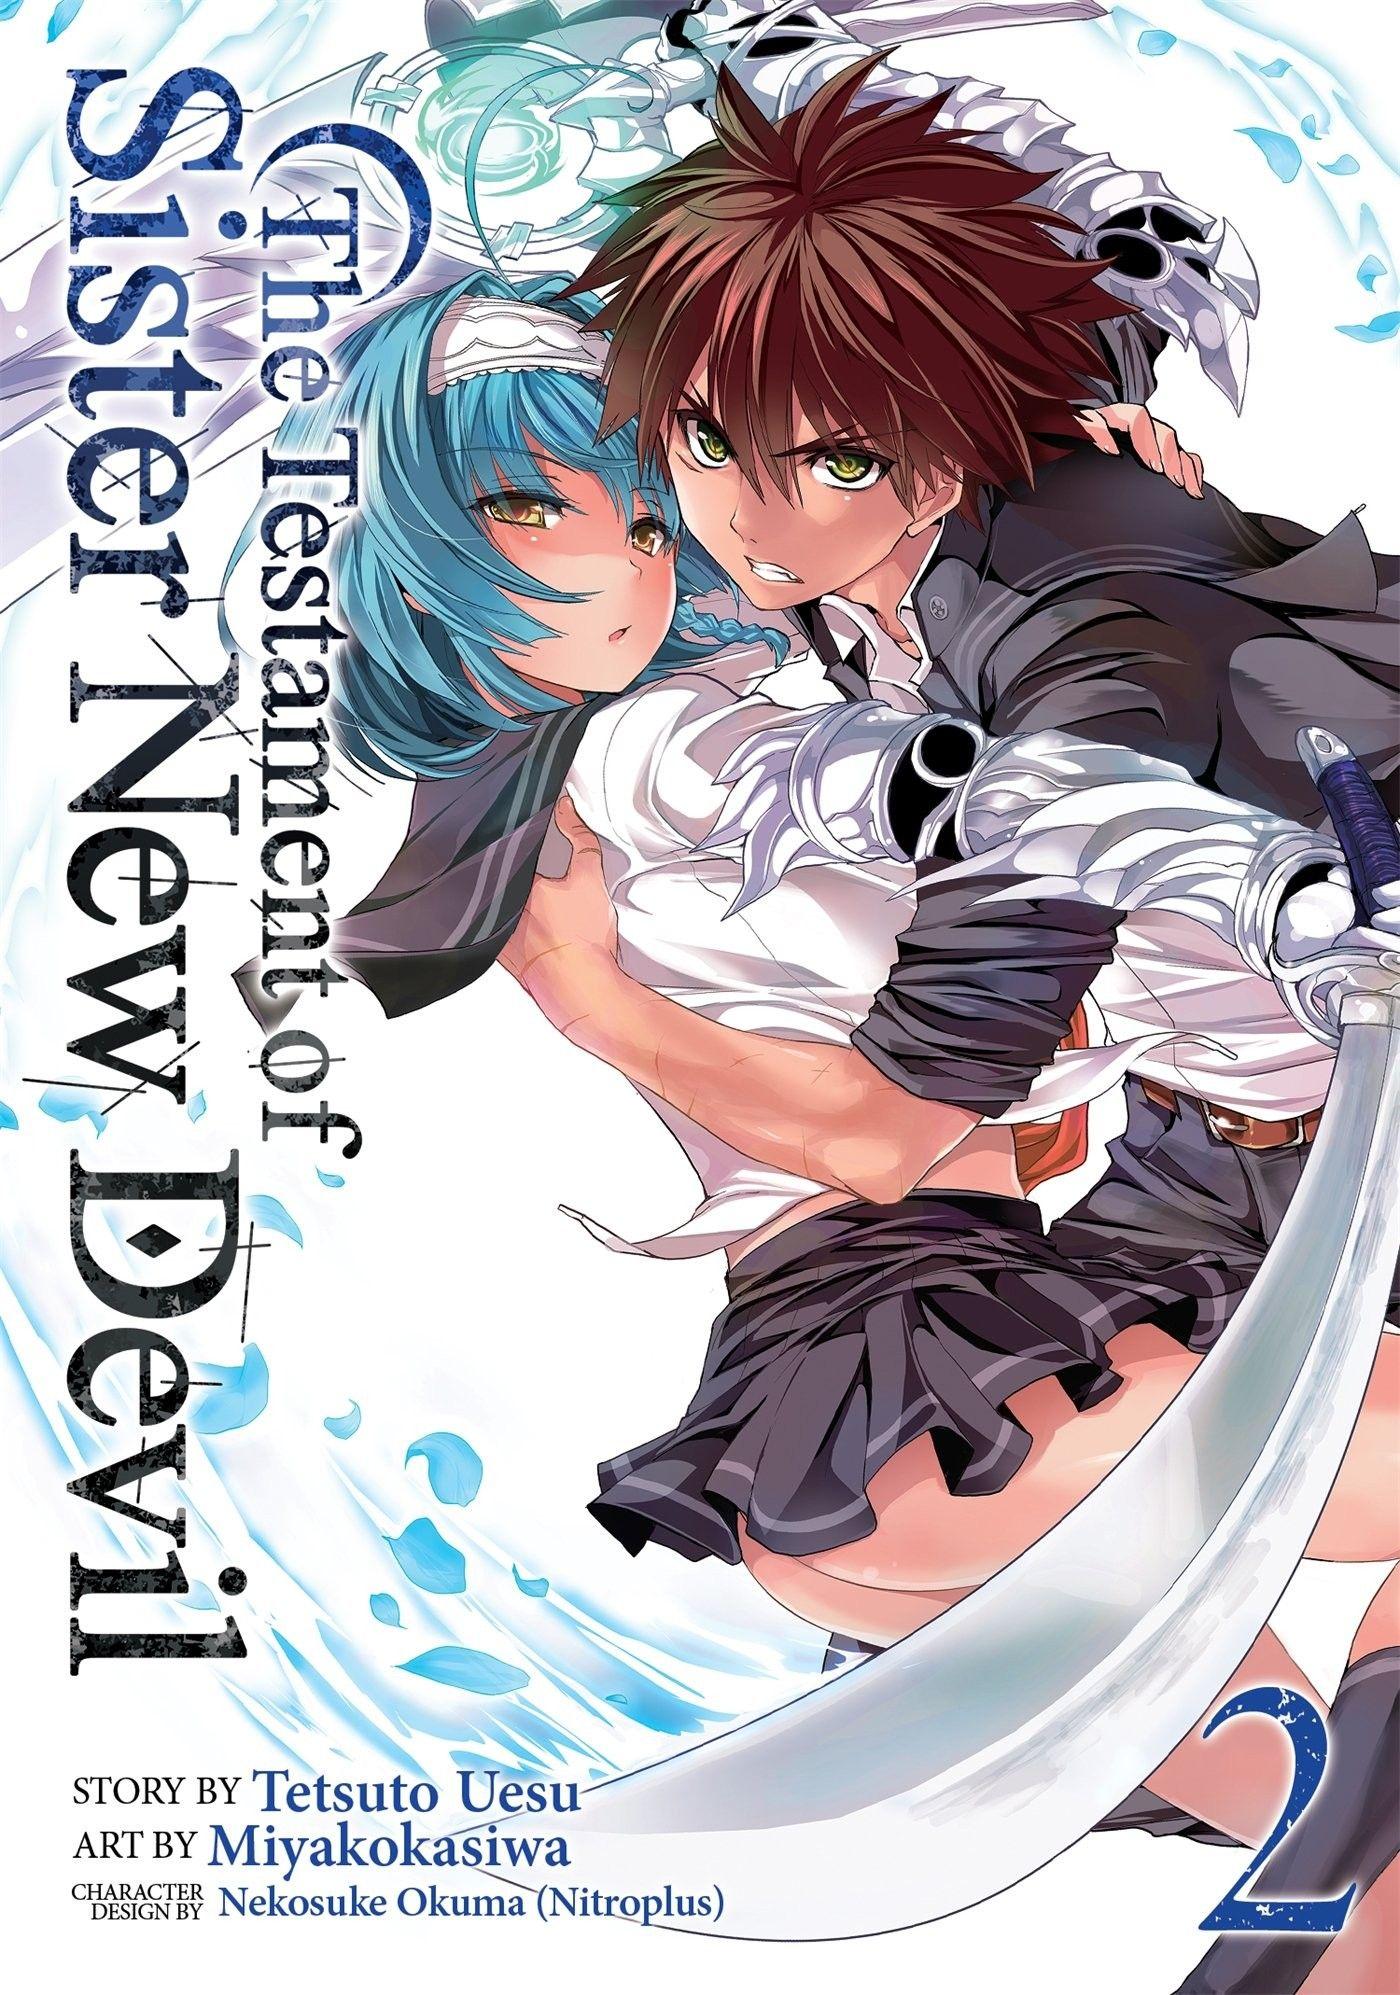 Pin By Matthew Lee On Muscle Manga Eyes Anime Light Novel